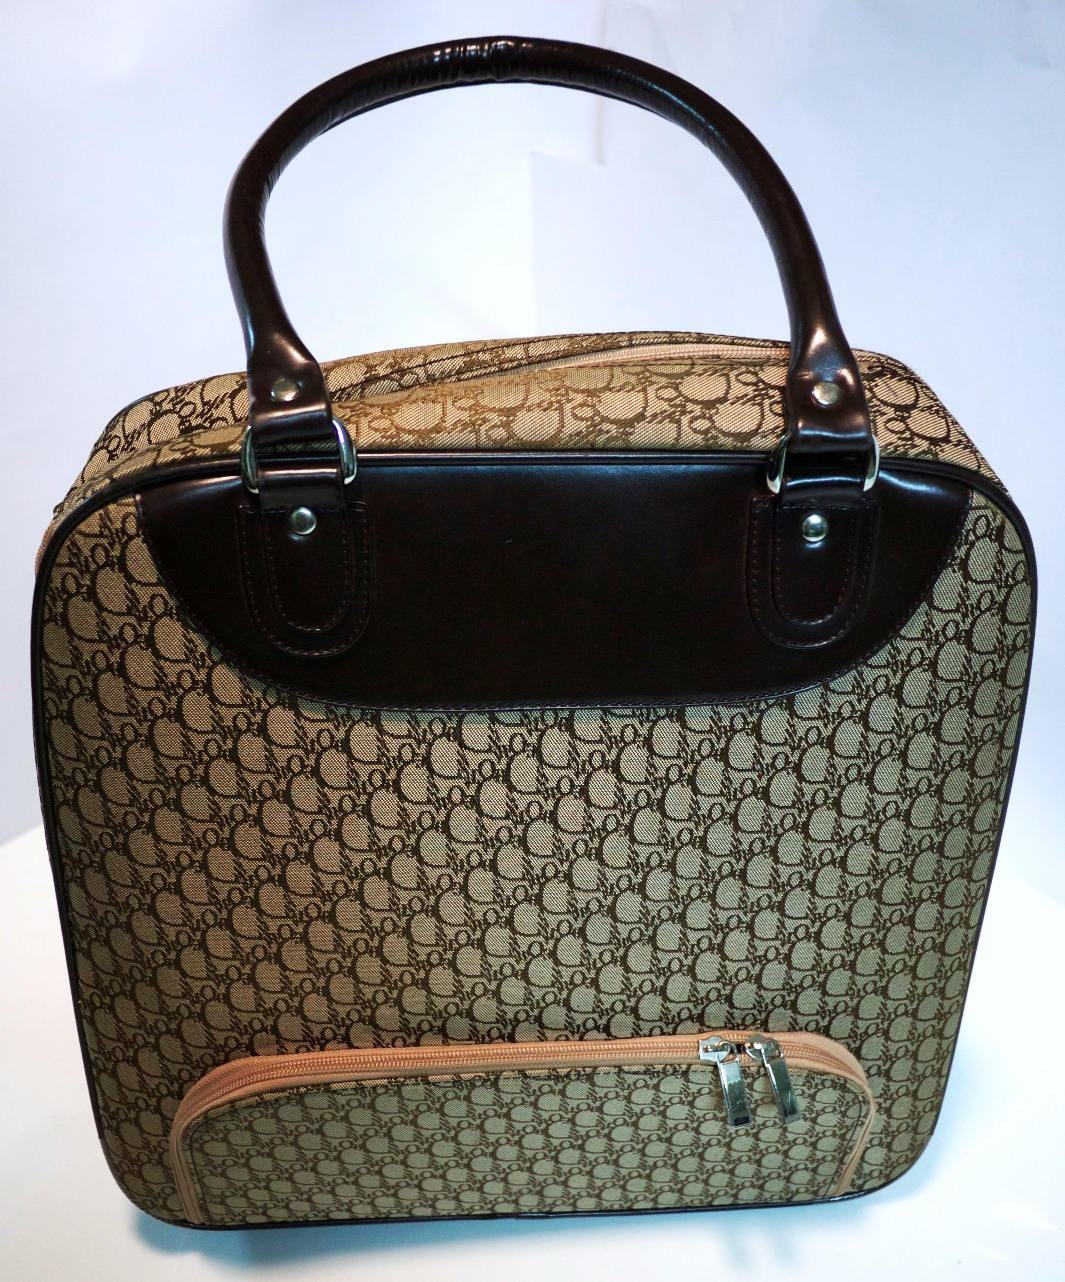 Gold and Brown Handbag